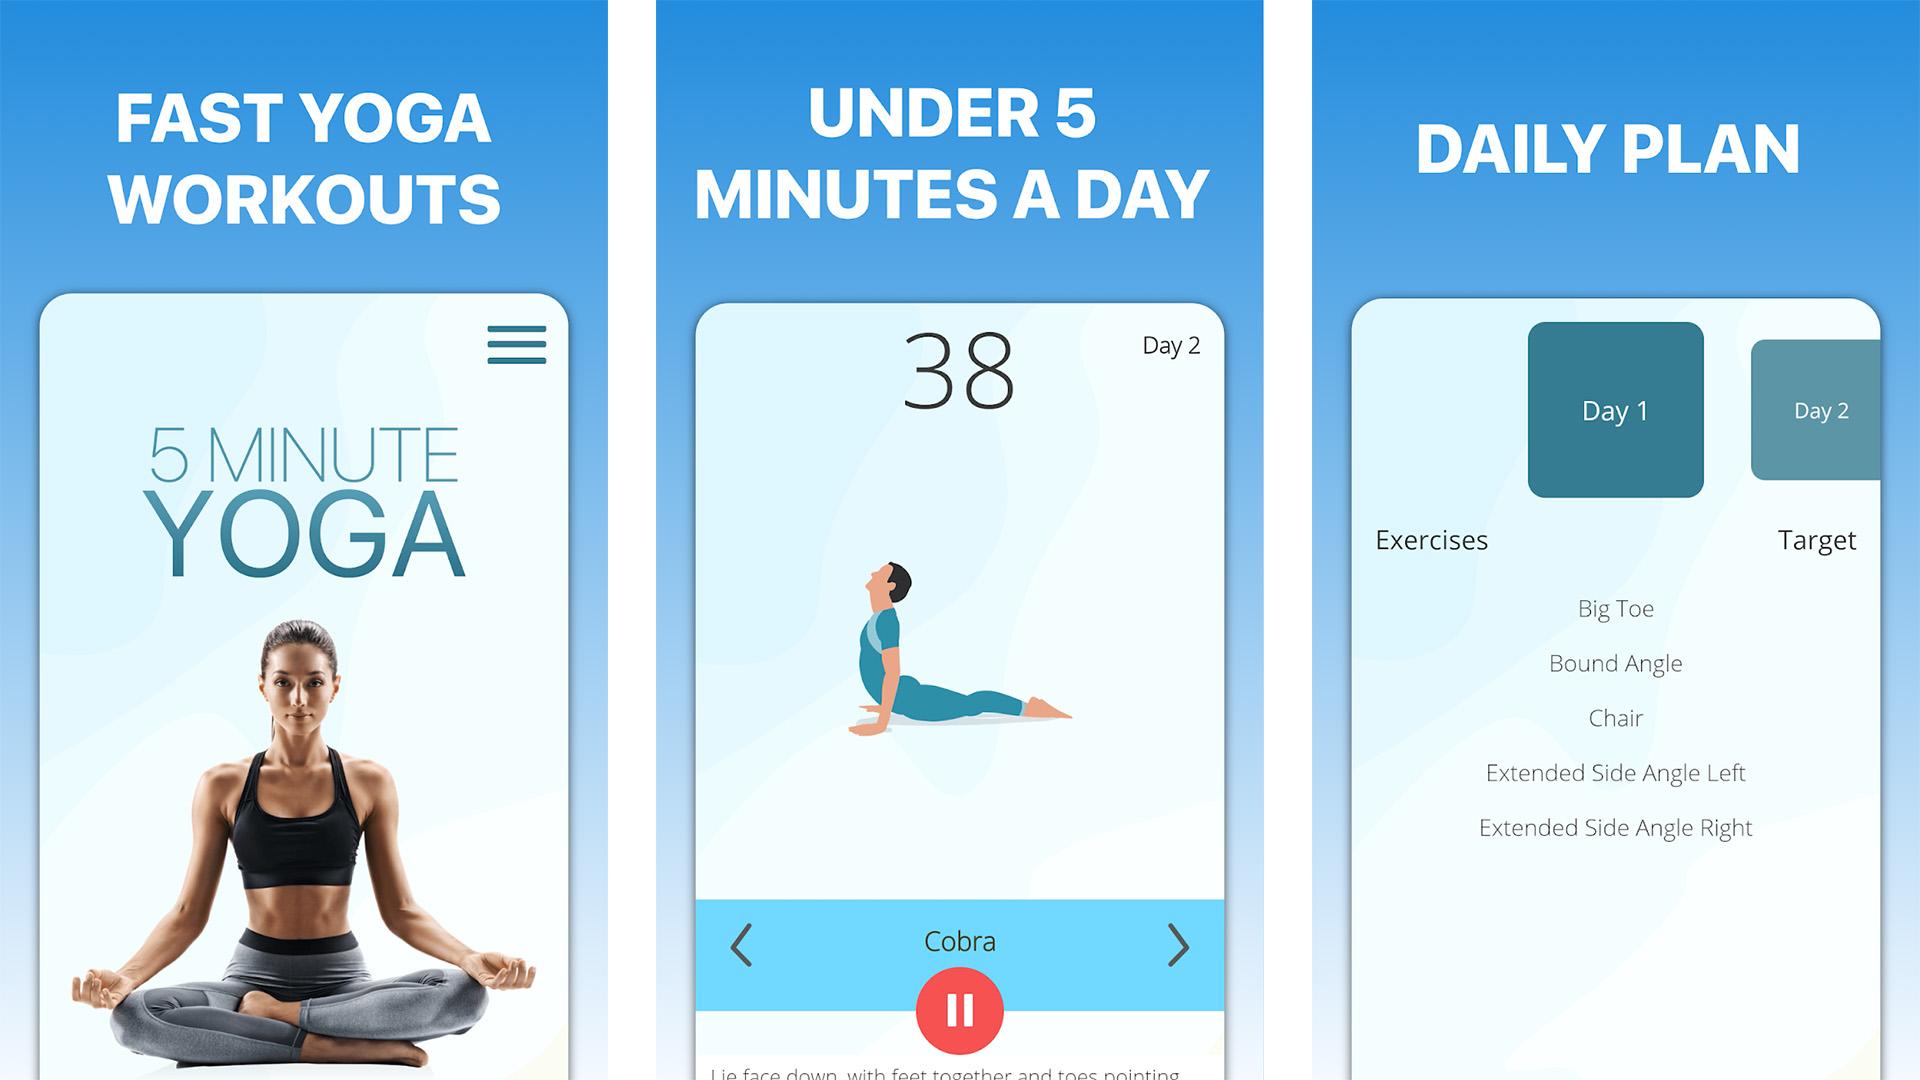 5 Minute Yoga screenshot 2021